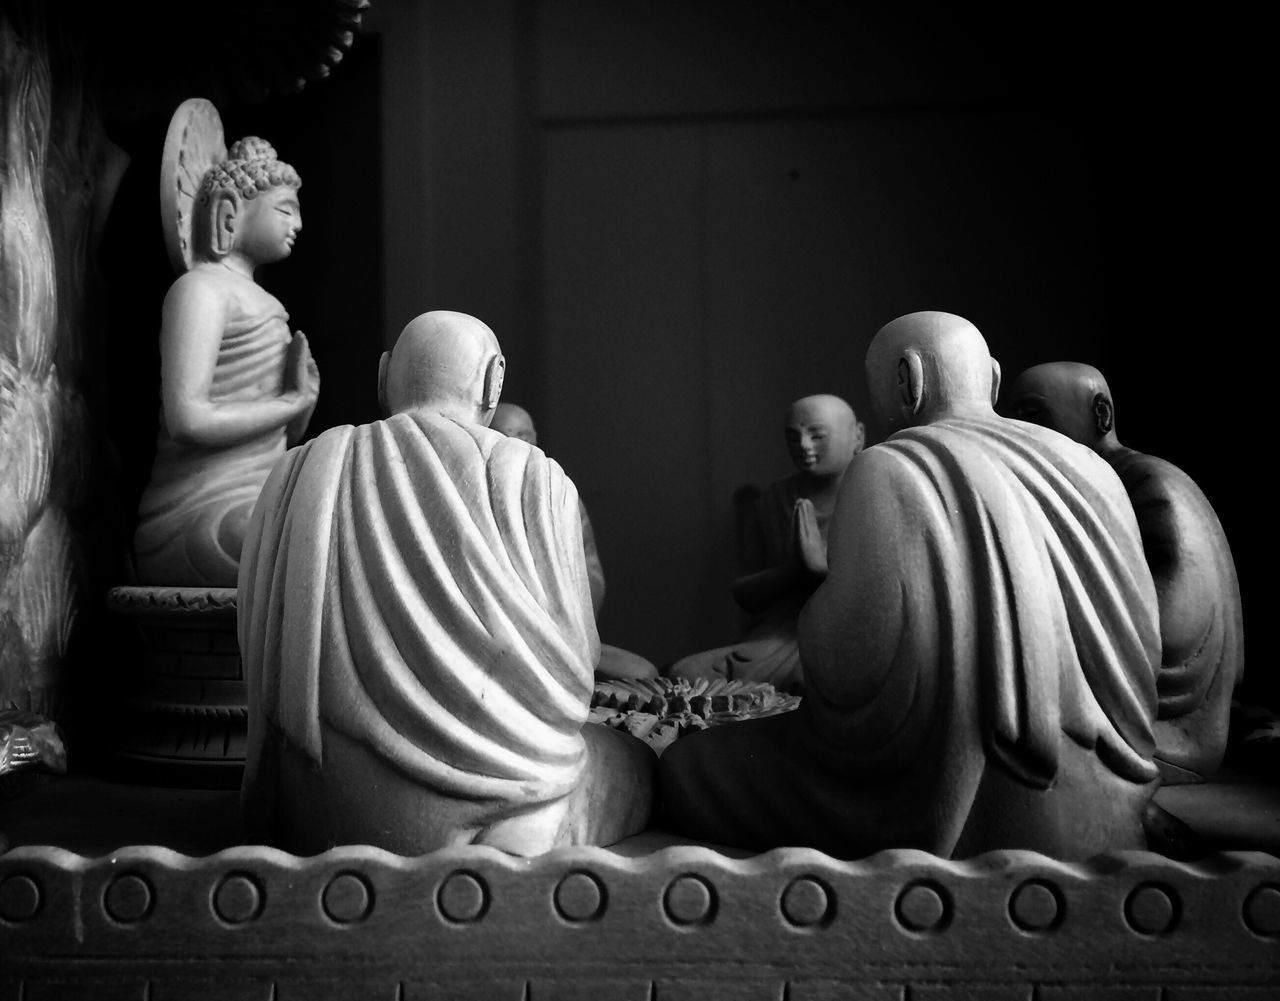 Buddhism Silence Meditation Retreat Sitting